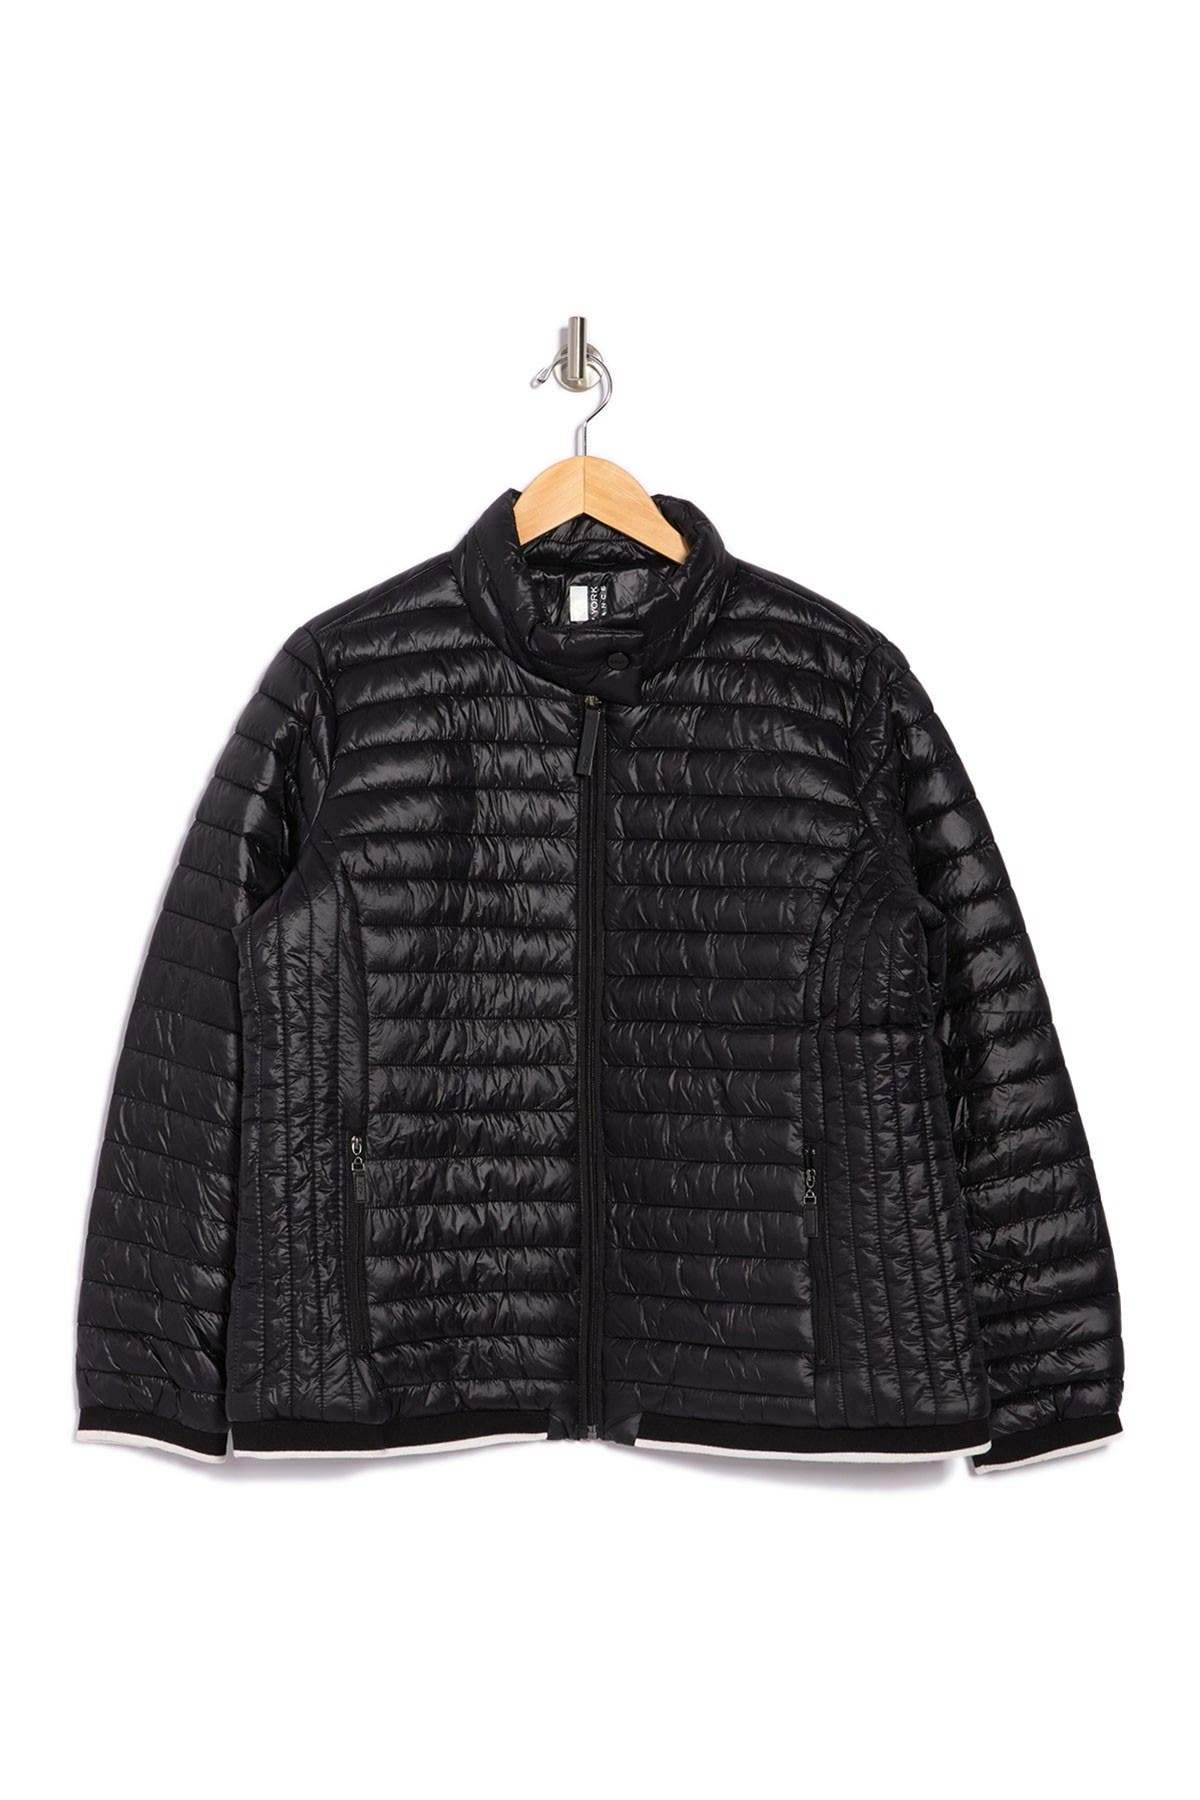 MARC NEW YORK PERFORMANCE Zip Front Packable Puffer Jacket